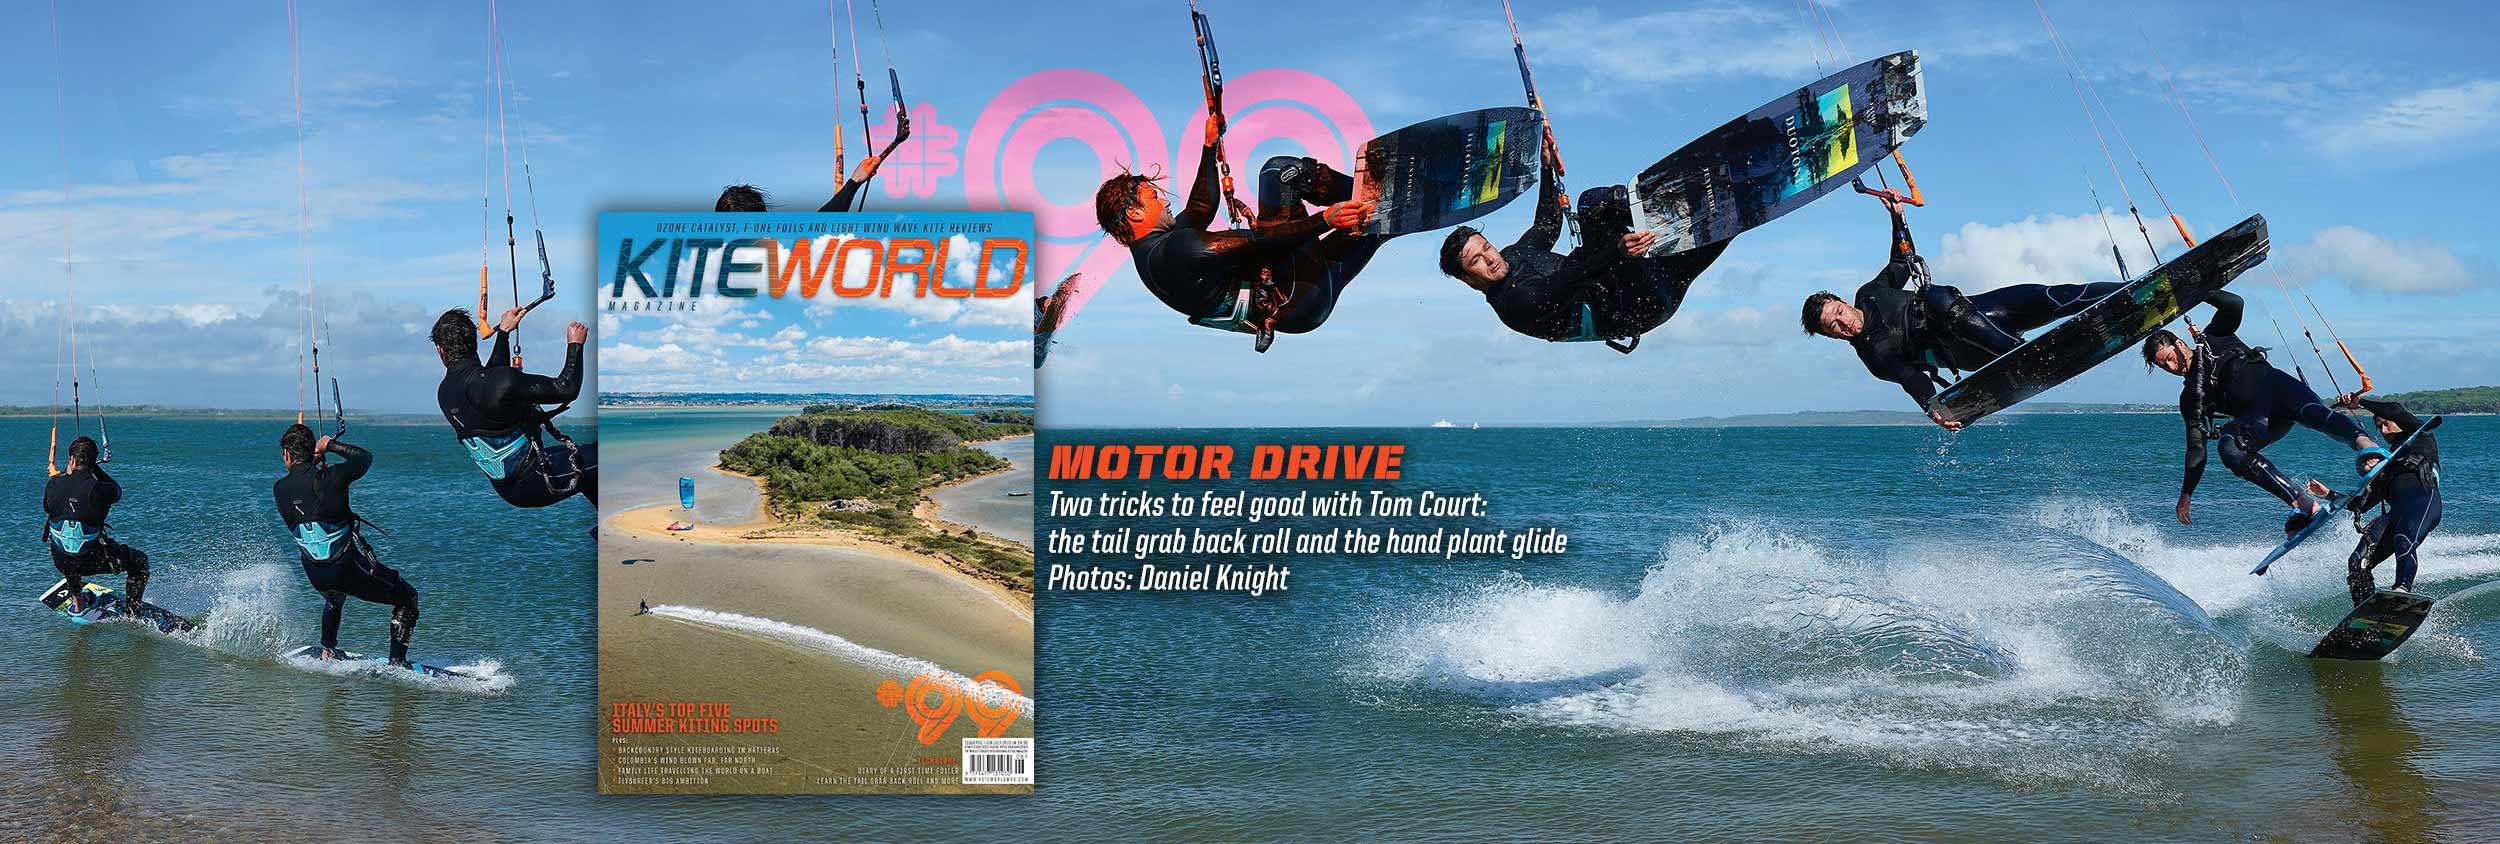 Kiteworld Issue 99 released